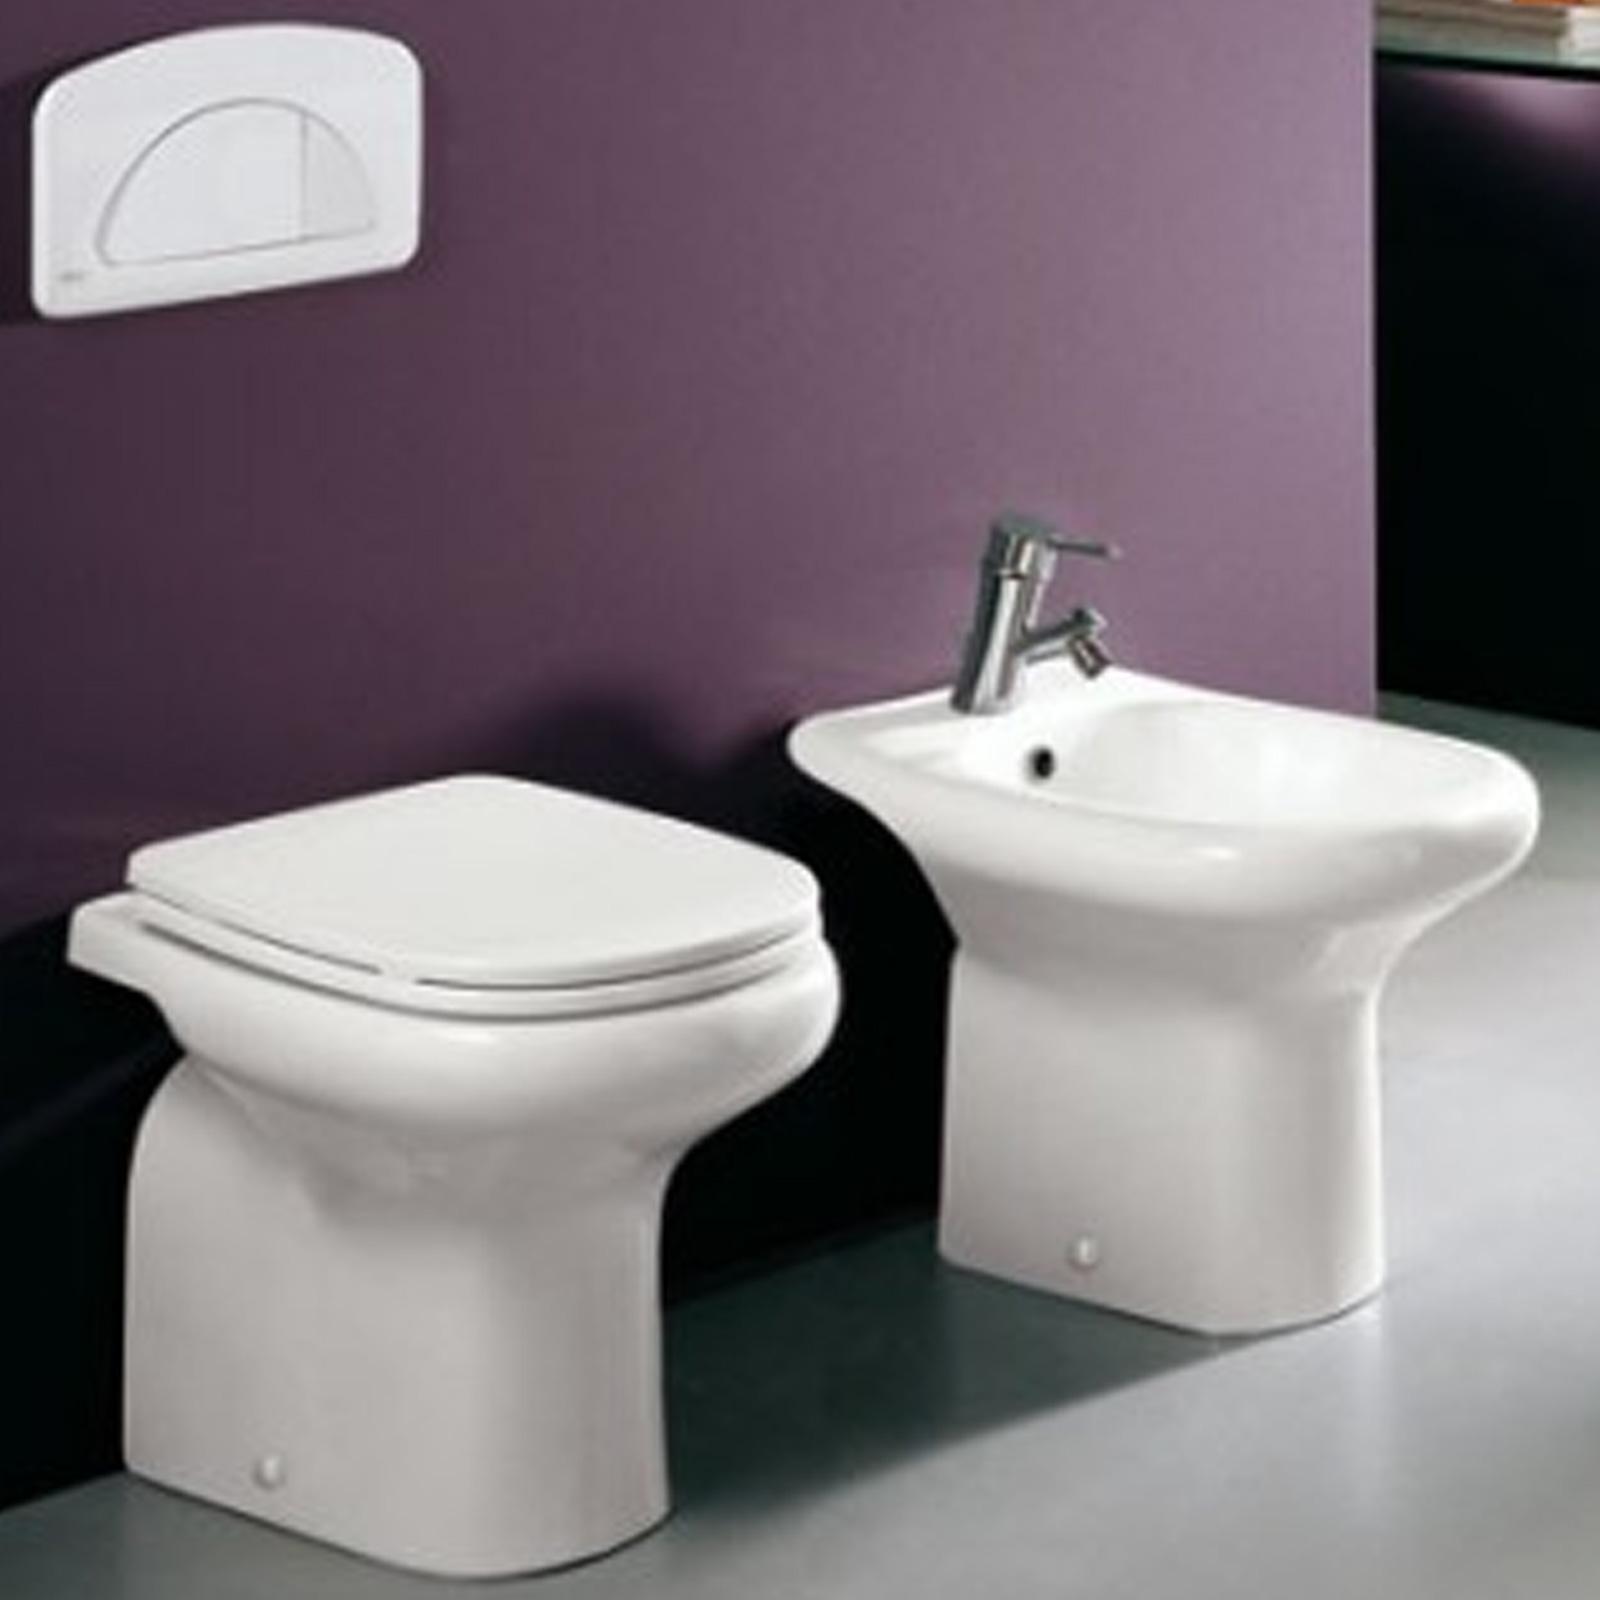 3 sanitari tradizionali wc bidet sedile ristrutturazione appartamenti trieste impresa - Sanitari bagno prezzi ...